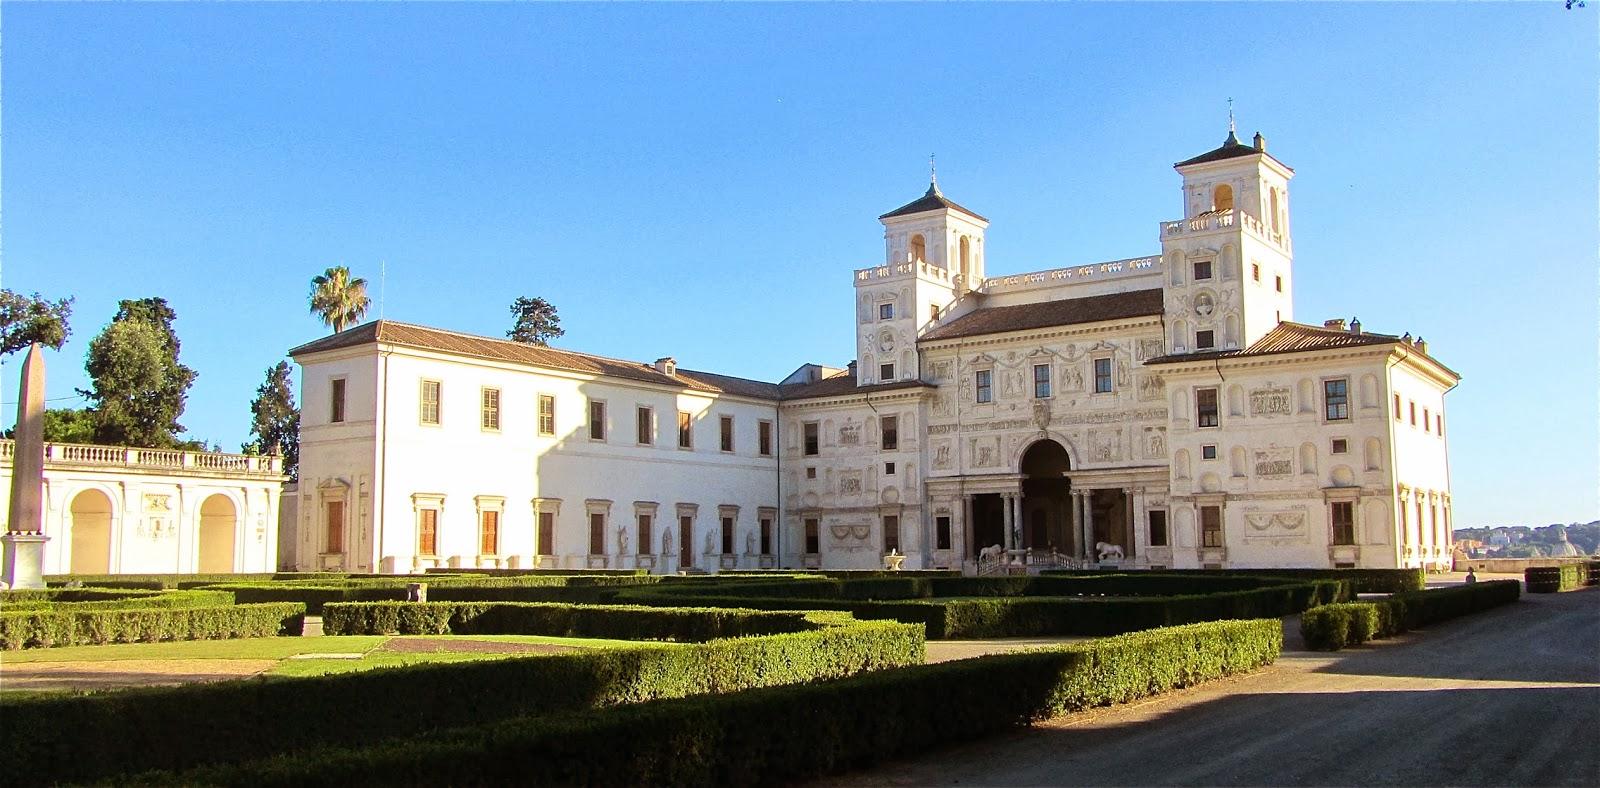 Sens et le dire villa m dicis si rome antique for Jardin villa medicis rome